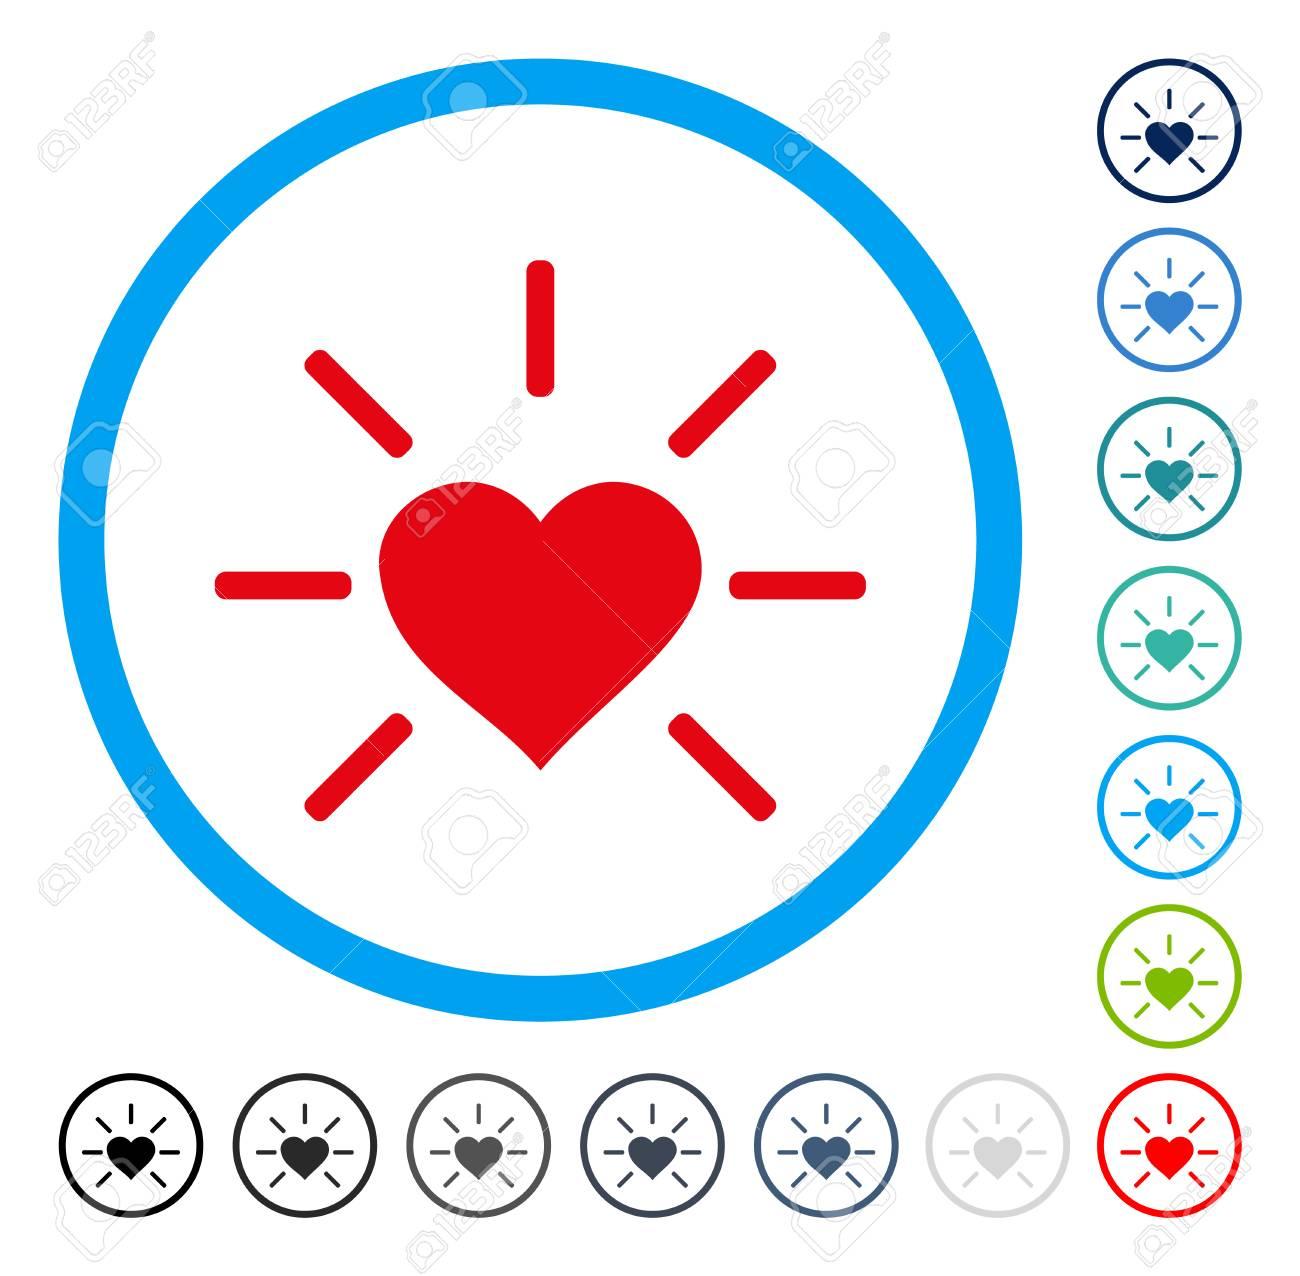 Shiny love heart icon inside round frame vector illustration shiny love heart icon inside round frame vector illustration style is a flat iconic symbol buycottarizona